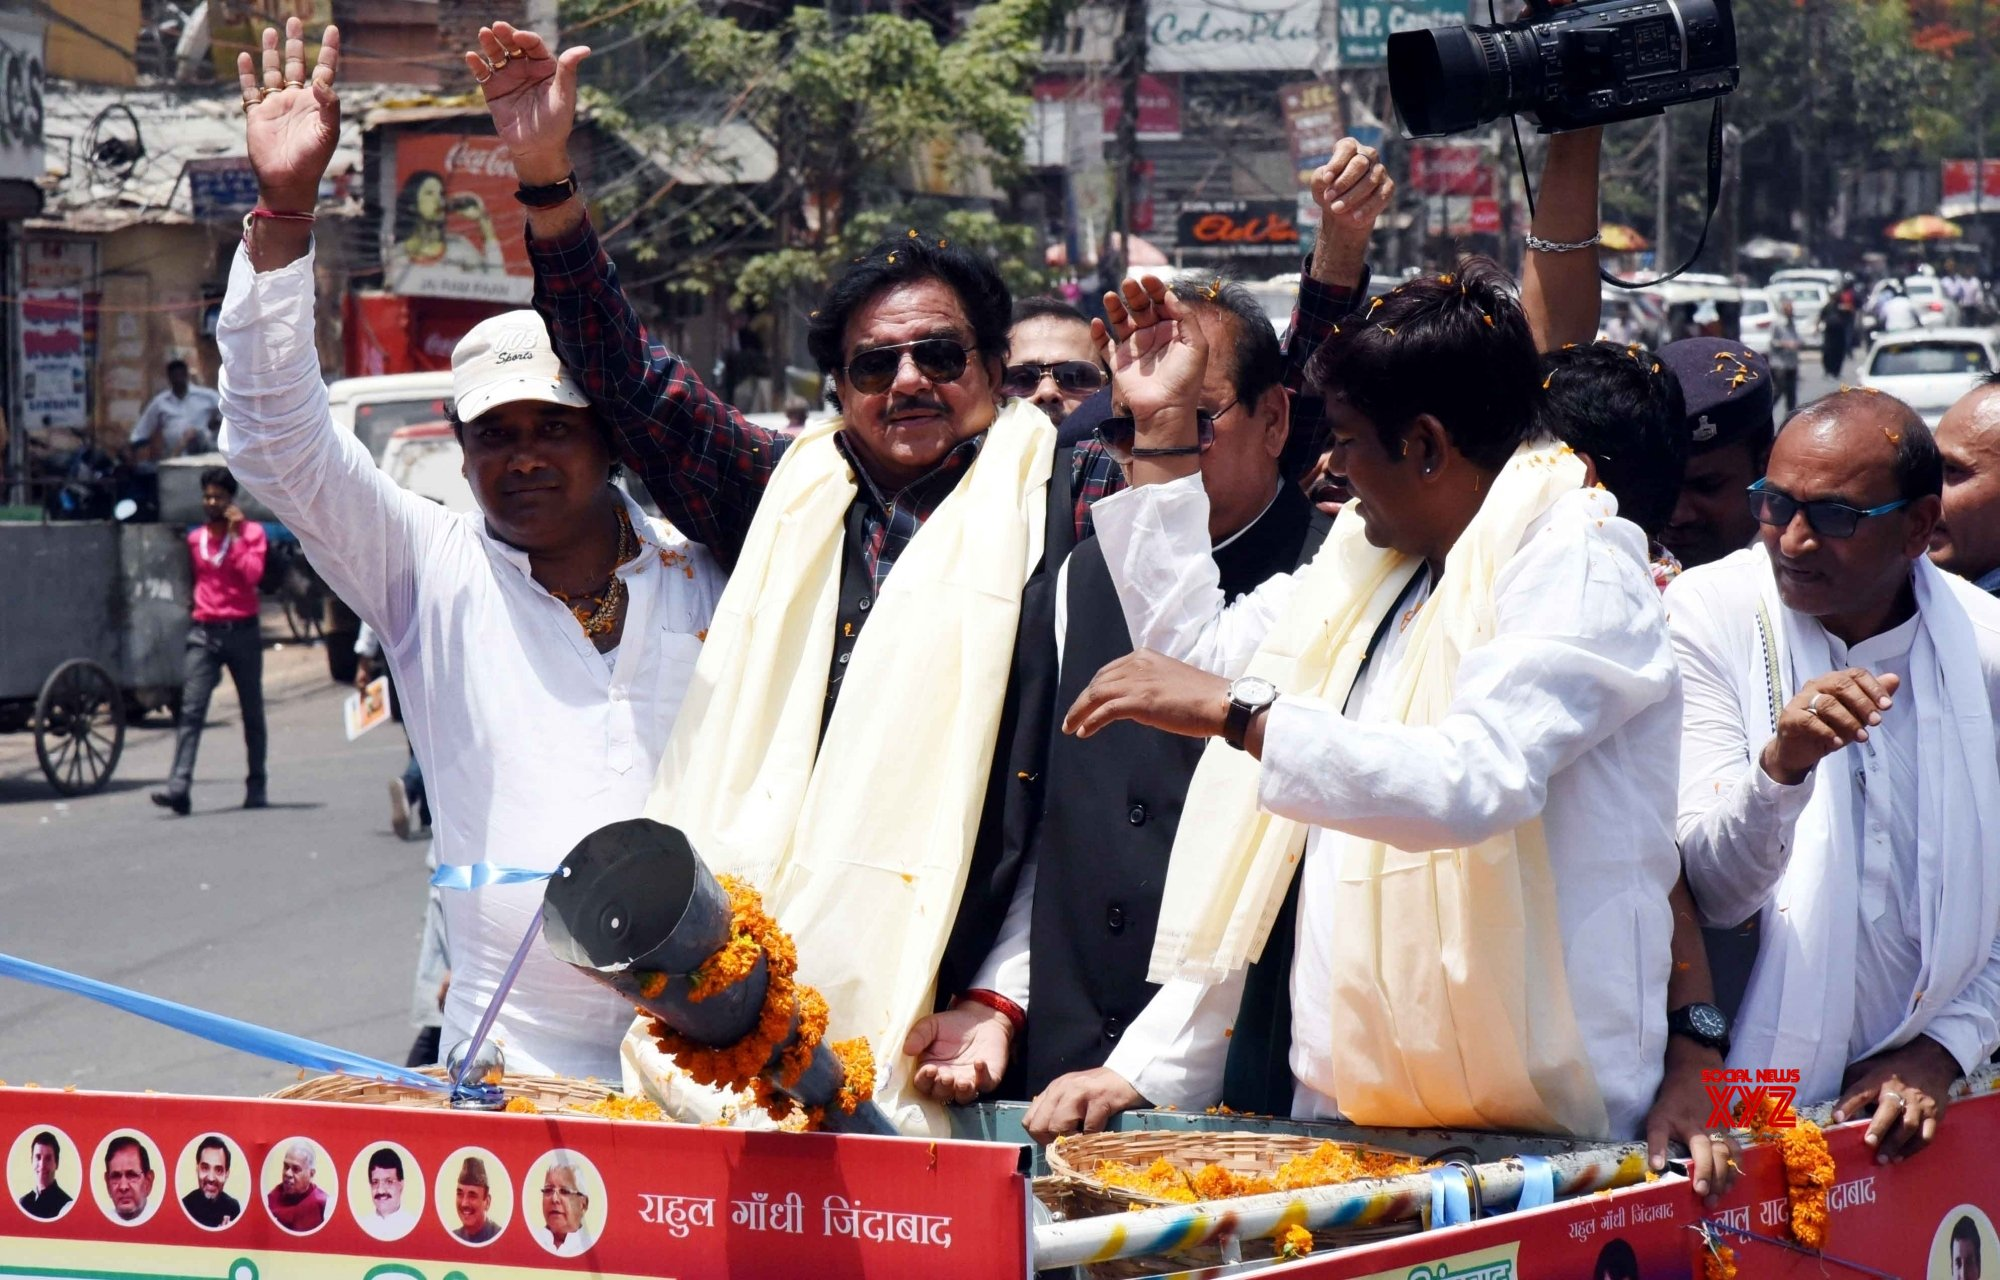 Patna: 2019 Lok Sabha elections - Shatrughan Sinha, Mukesh Sahni during a roadshow #Gallery